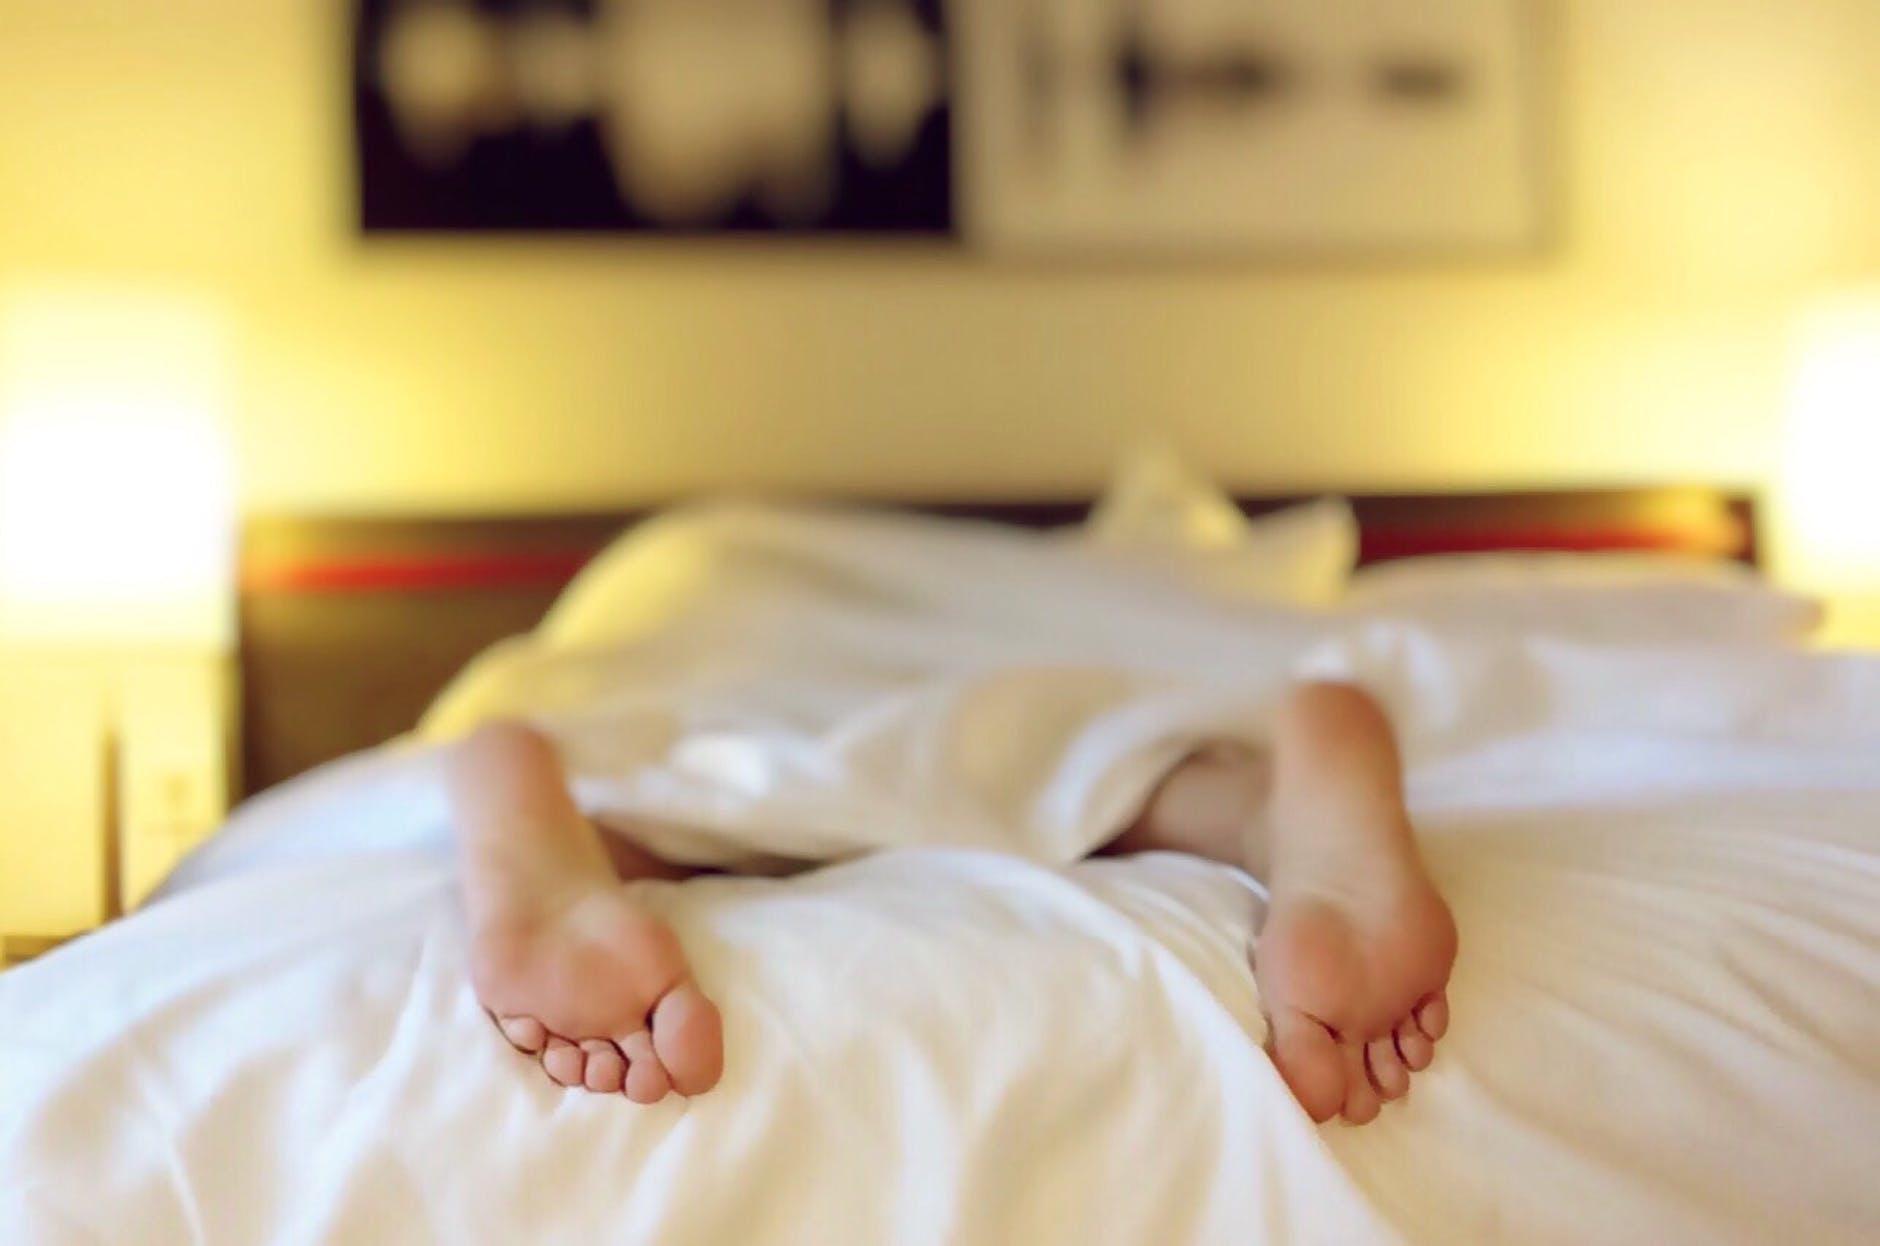 alone bed bedroom blur